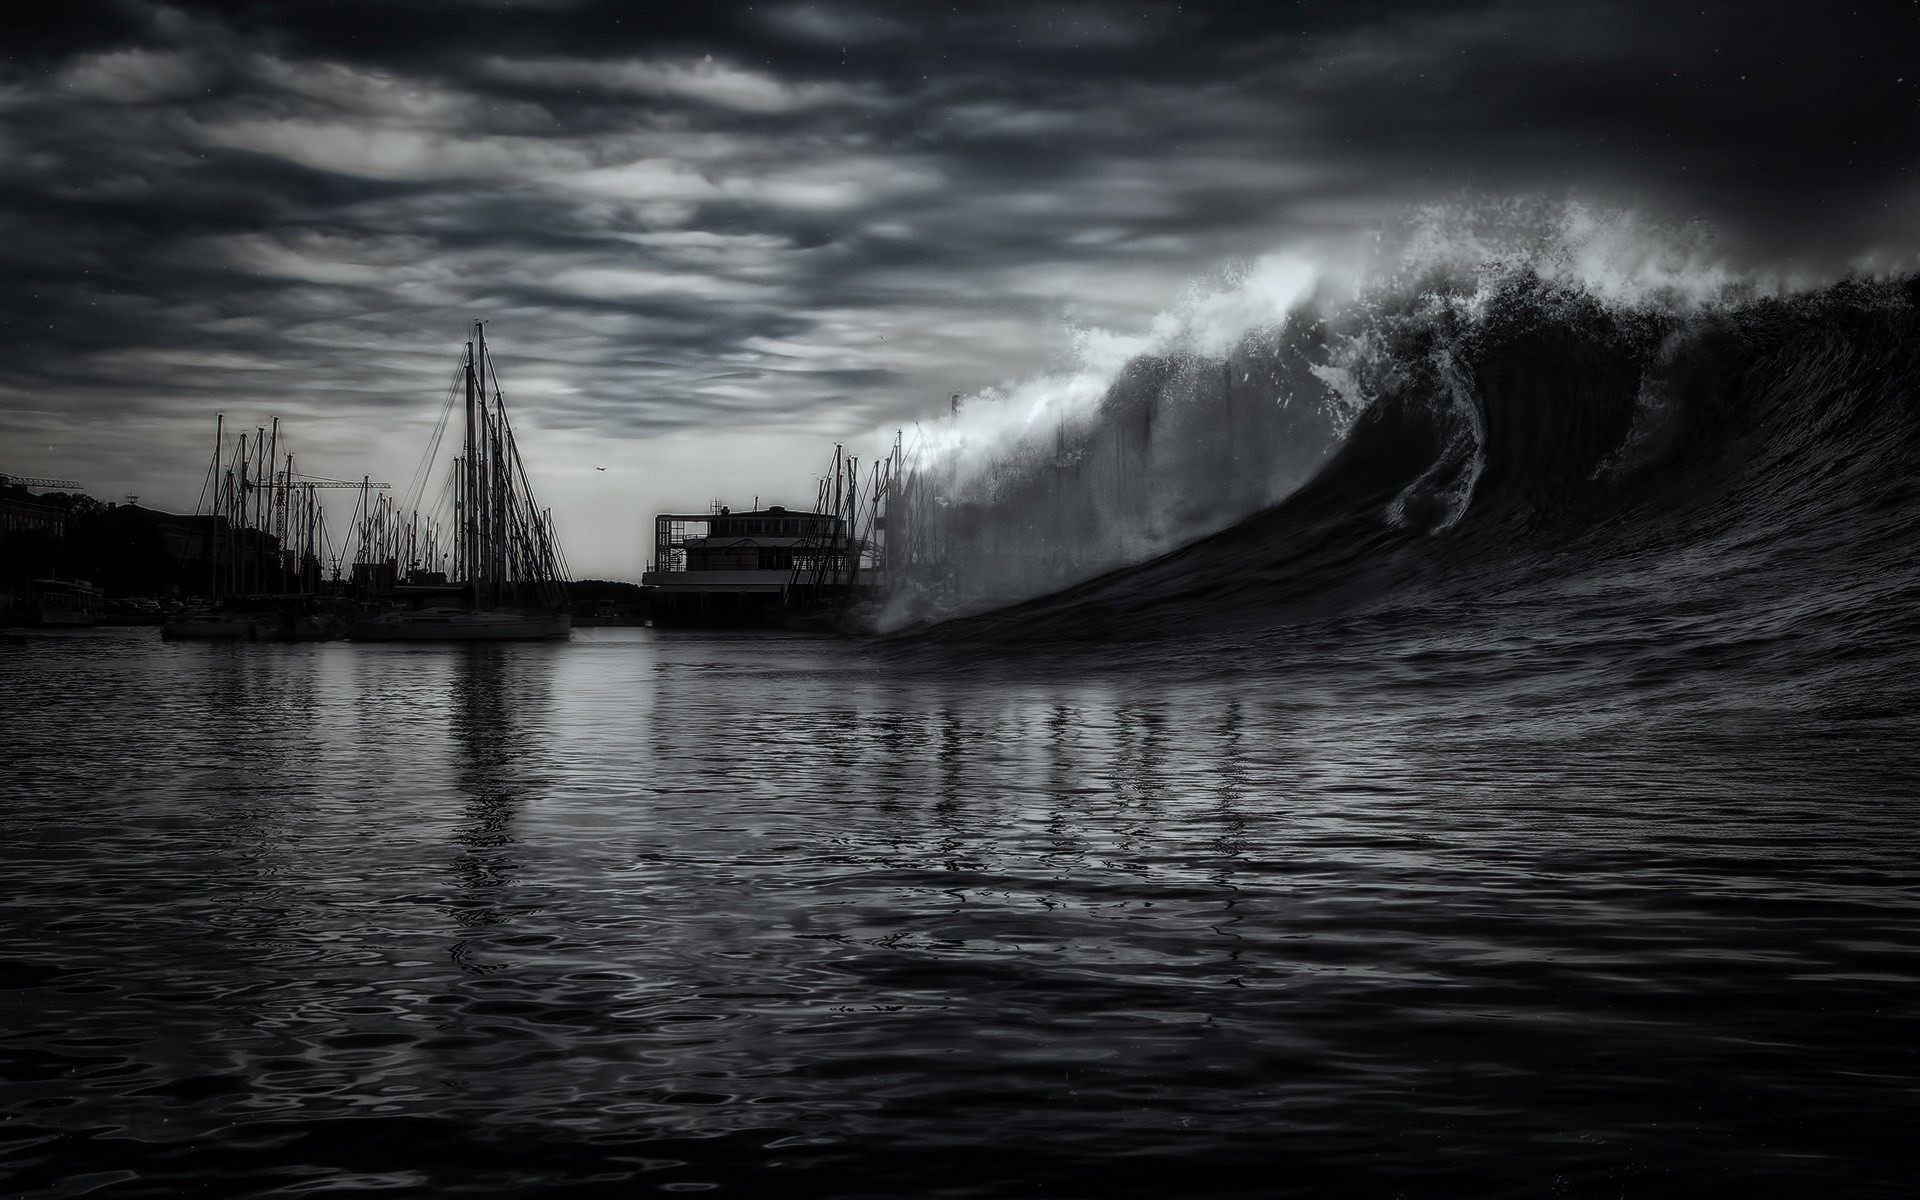 Halley Bush – Amazing ocean wallpaper – 1920 x 1080 px | ololoshenka |  Pinterest | Ocean, Mac desktop and Screensaver